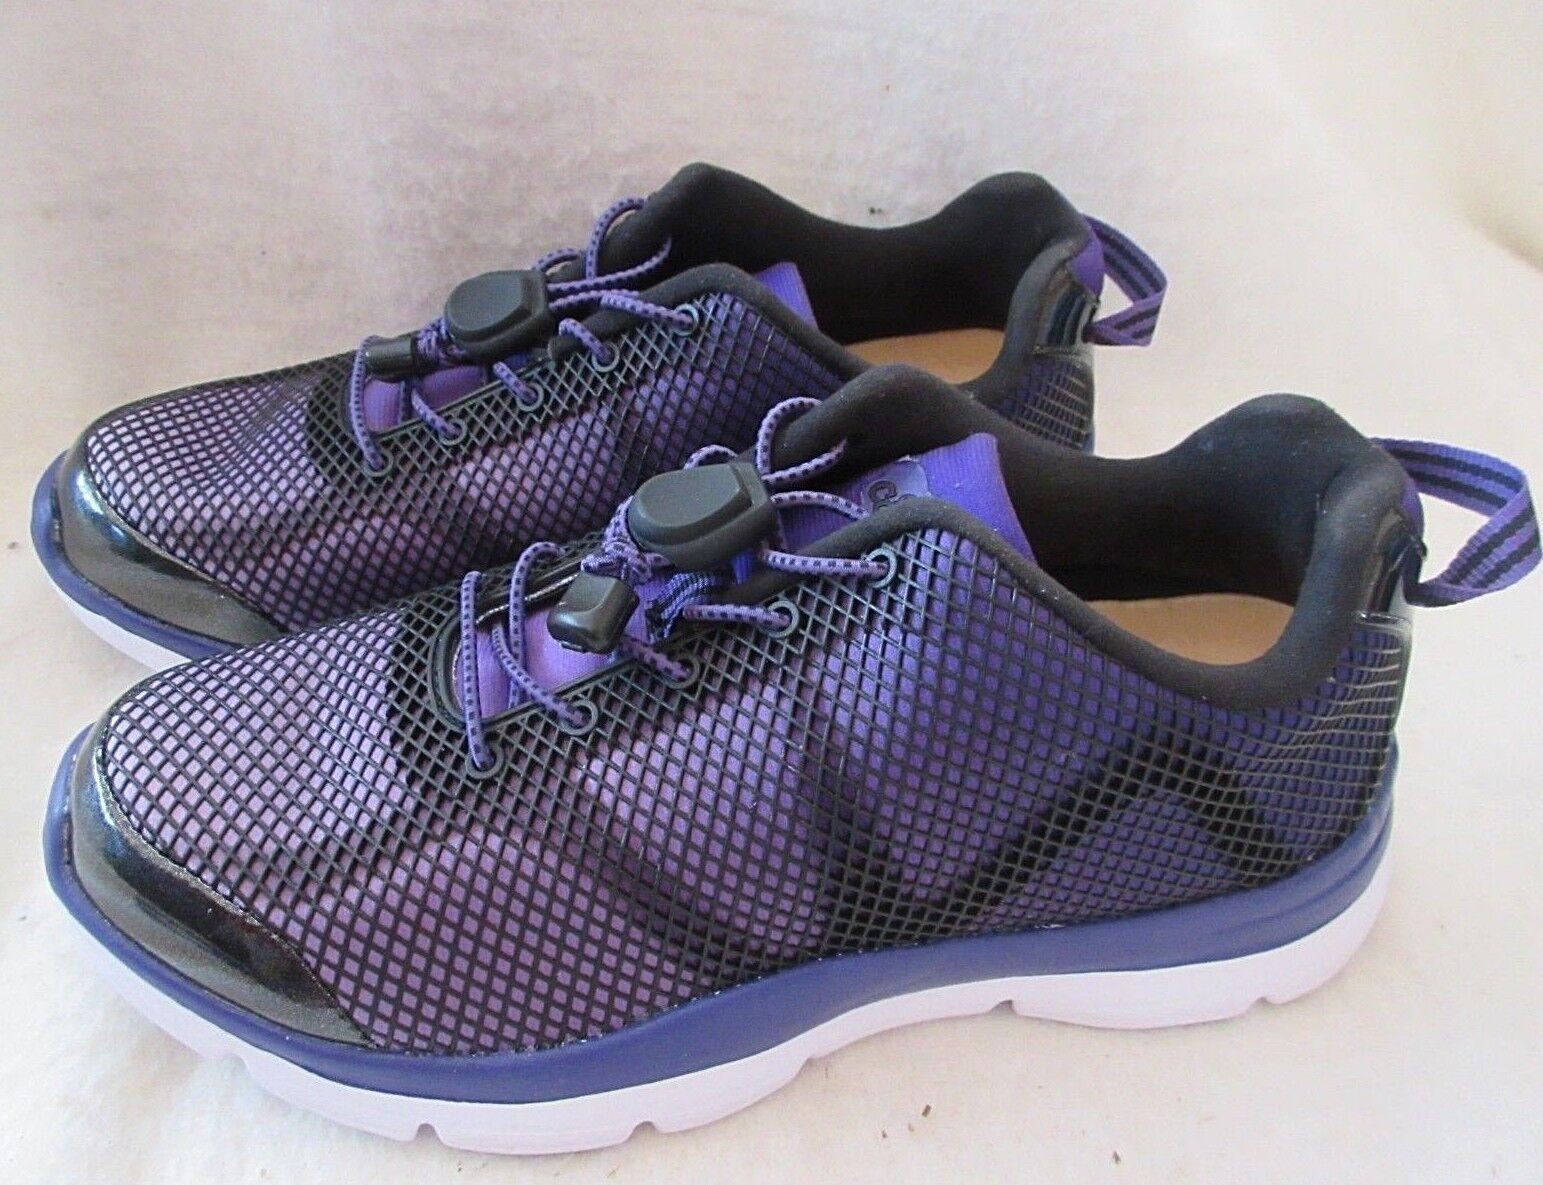 Dr. COMFORT  Katy  Women's 7 M Purple Therapeutic Comfort Sneakers  37755